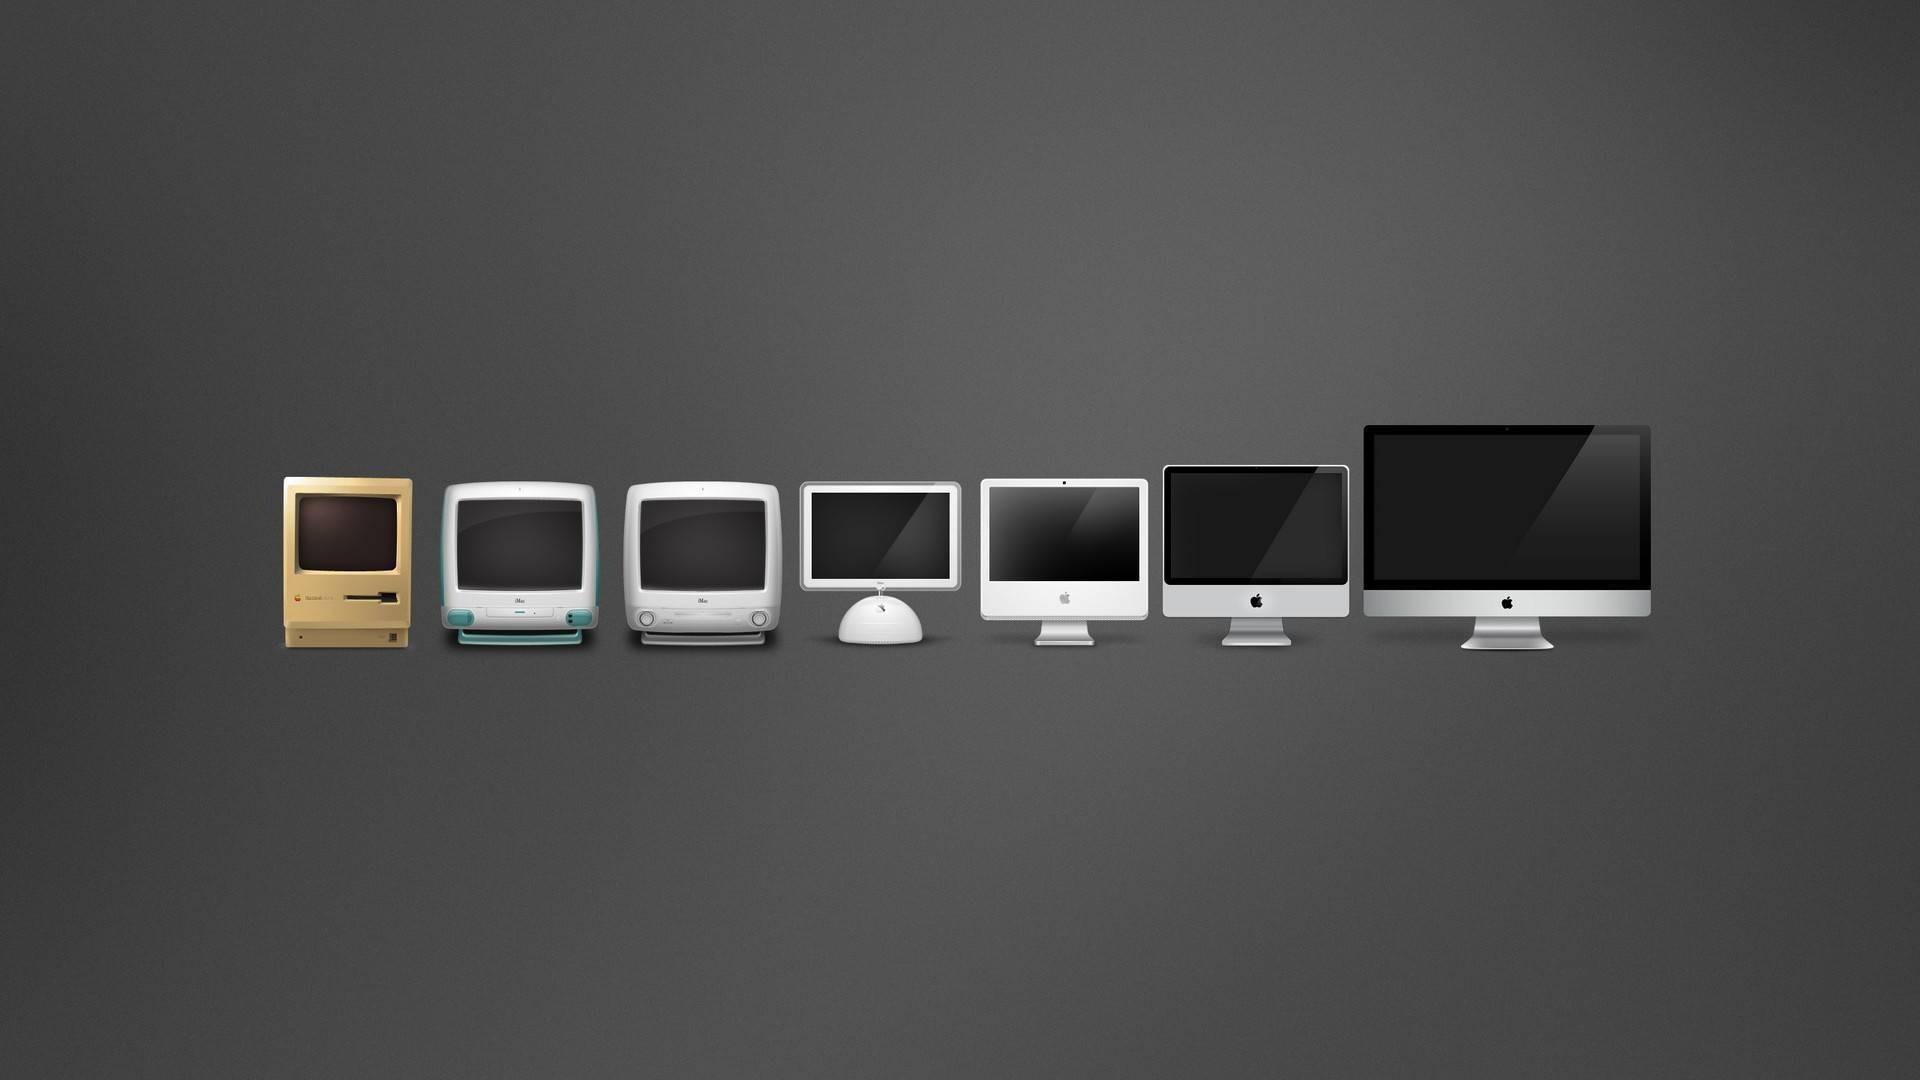 Apple Products Evolution Minimalist Desktop Wallpaper Uploaded by  DesktopWalls